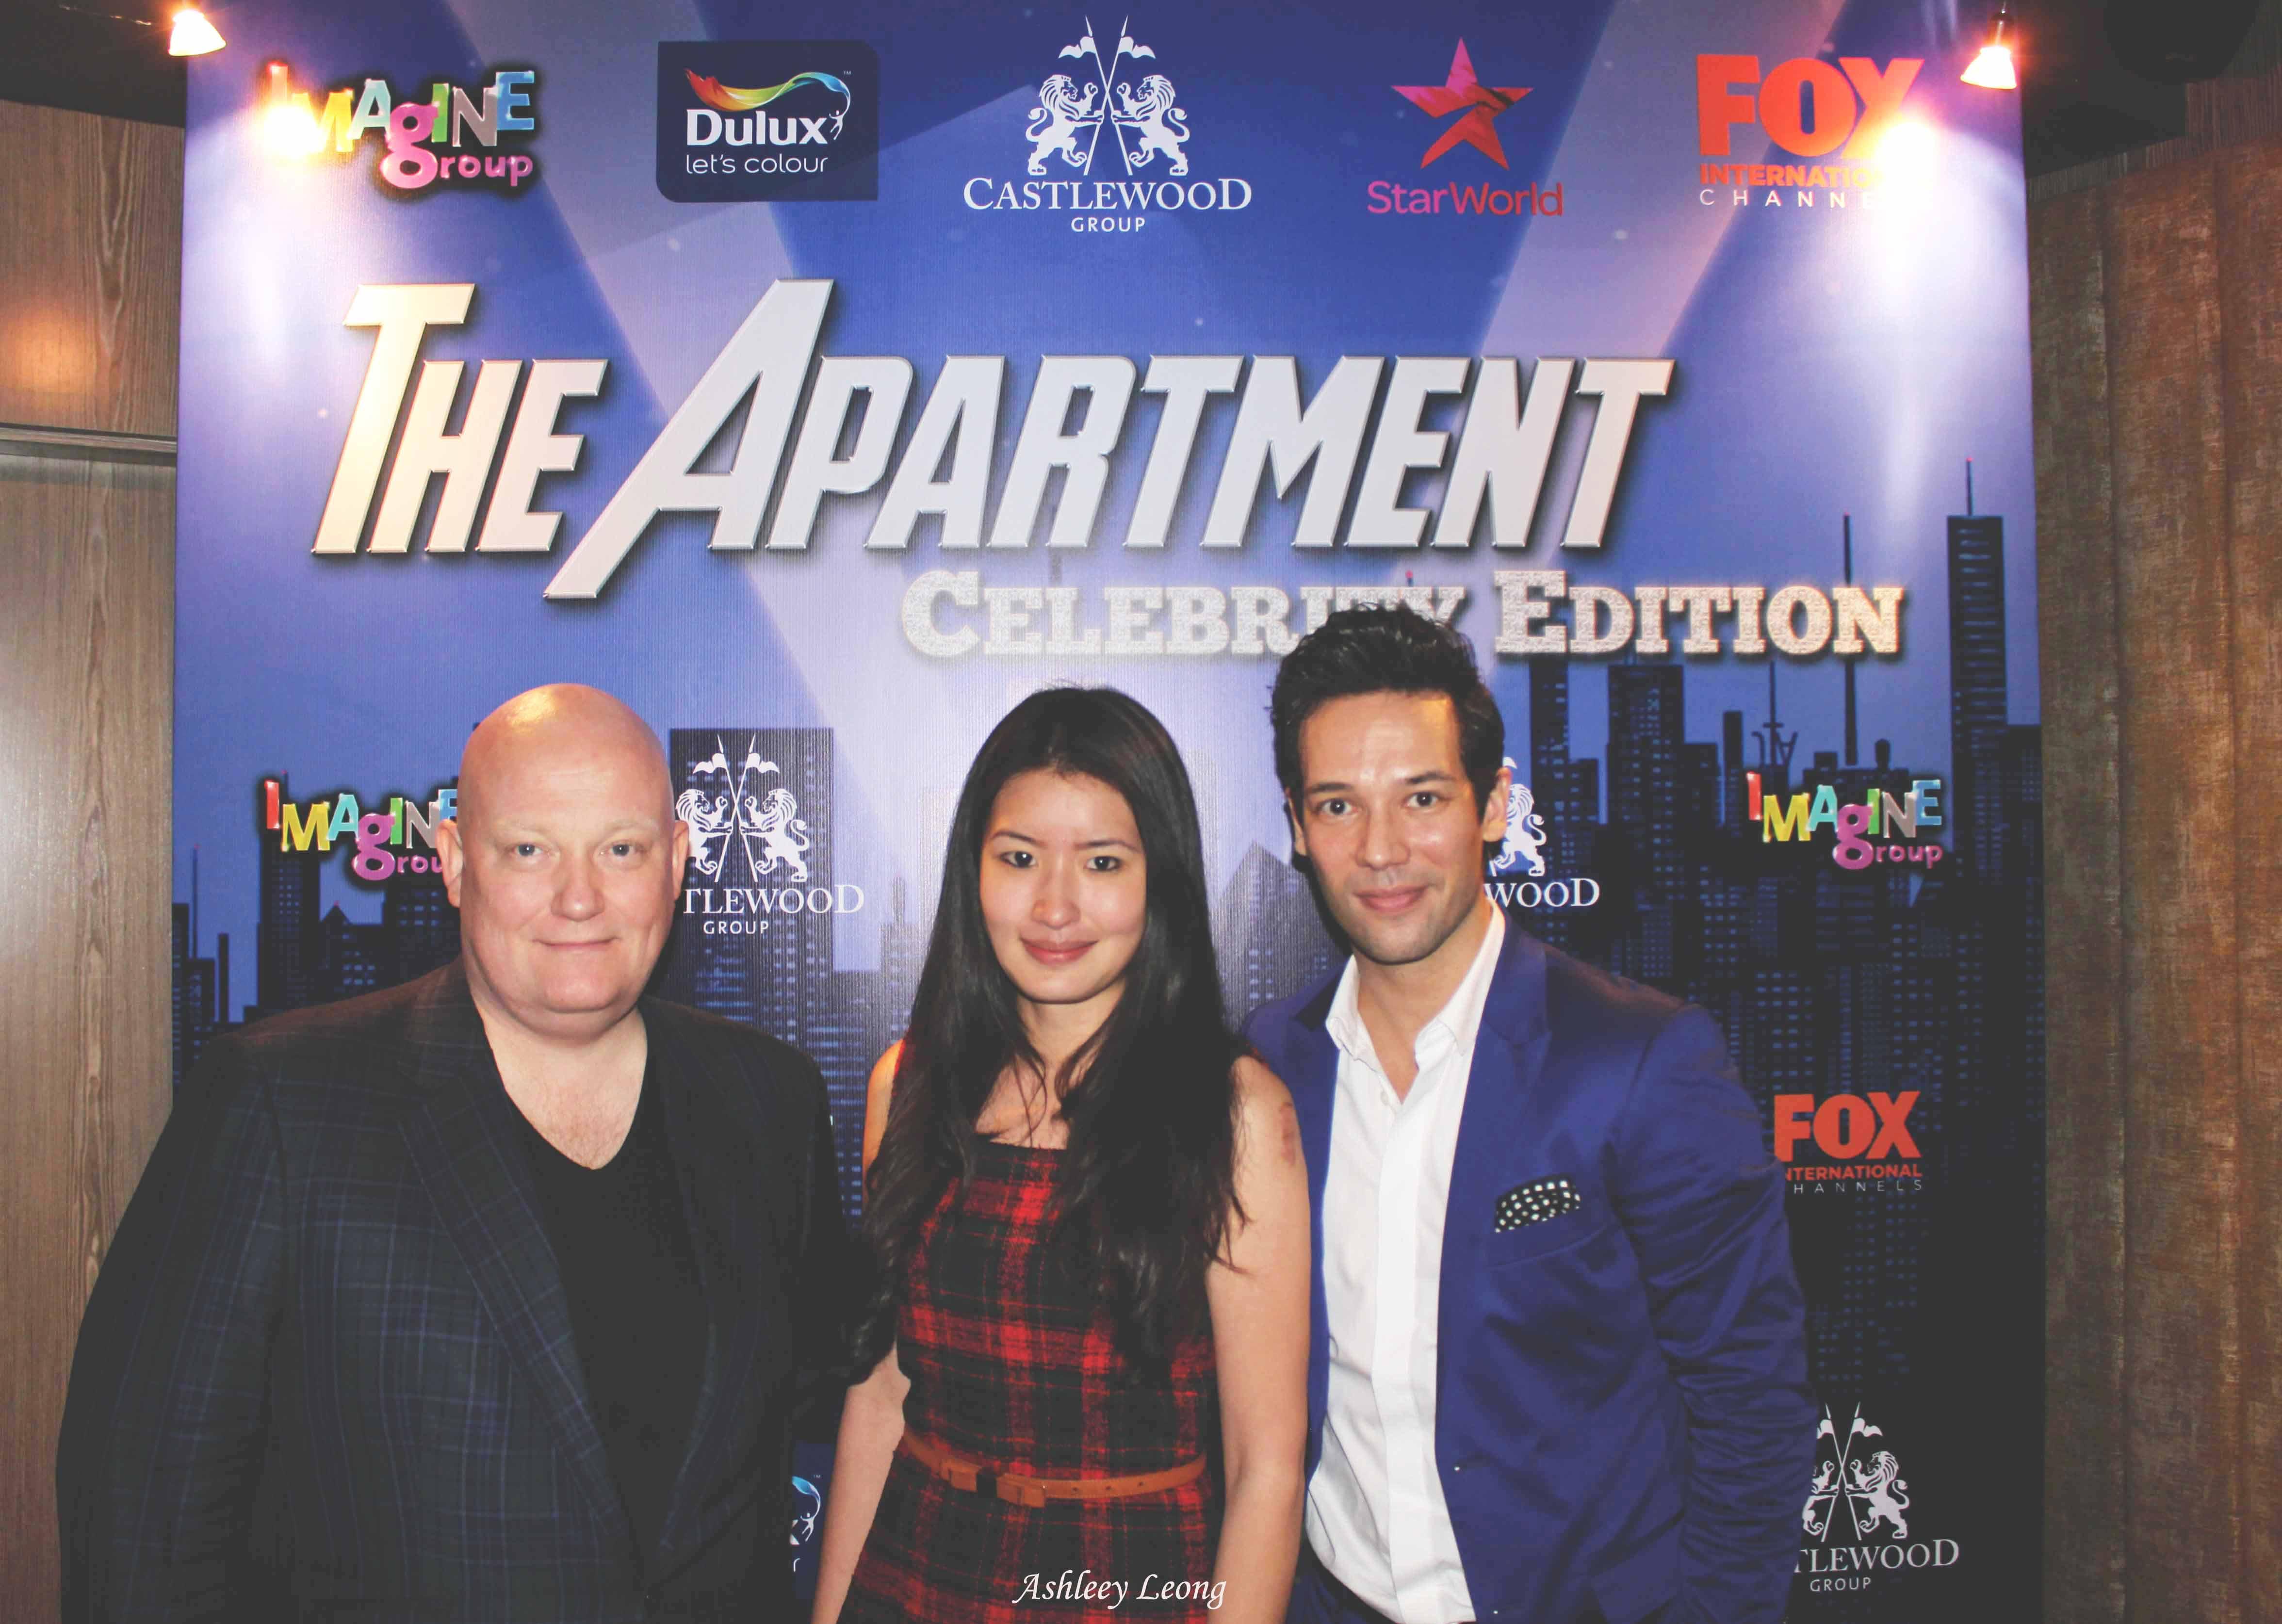 12 Celebrities Line-up in The Apartment's Latest Season - Alvinology